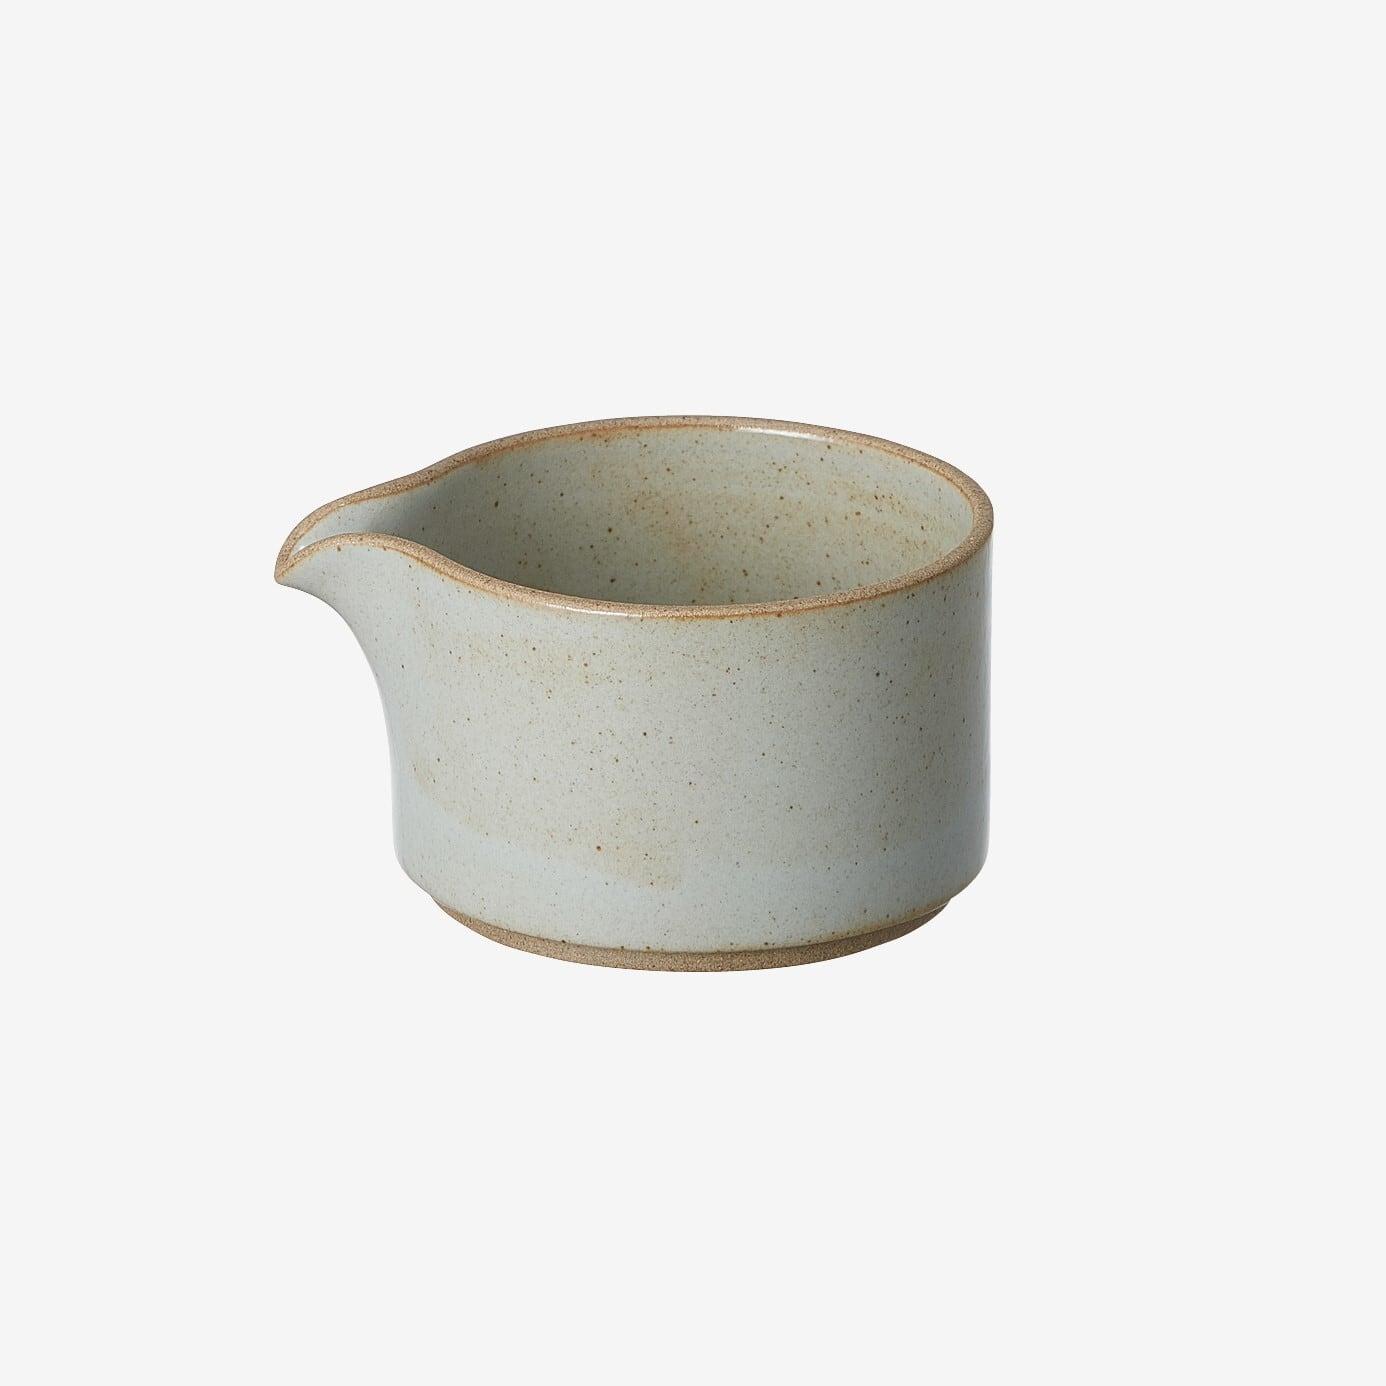 HASAMI PORCELAIN (ハサミポーセリン) Milk Pitcher (Clear / グレー) HPM028【85x72】 ミルクピッチャー